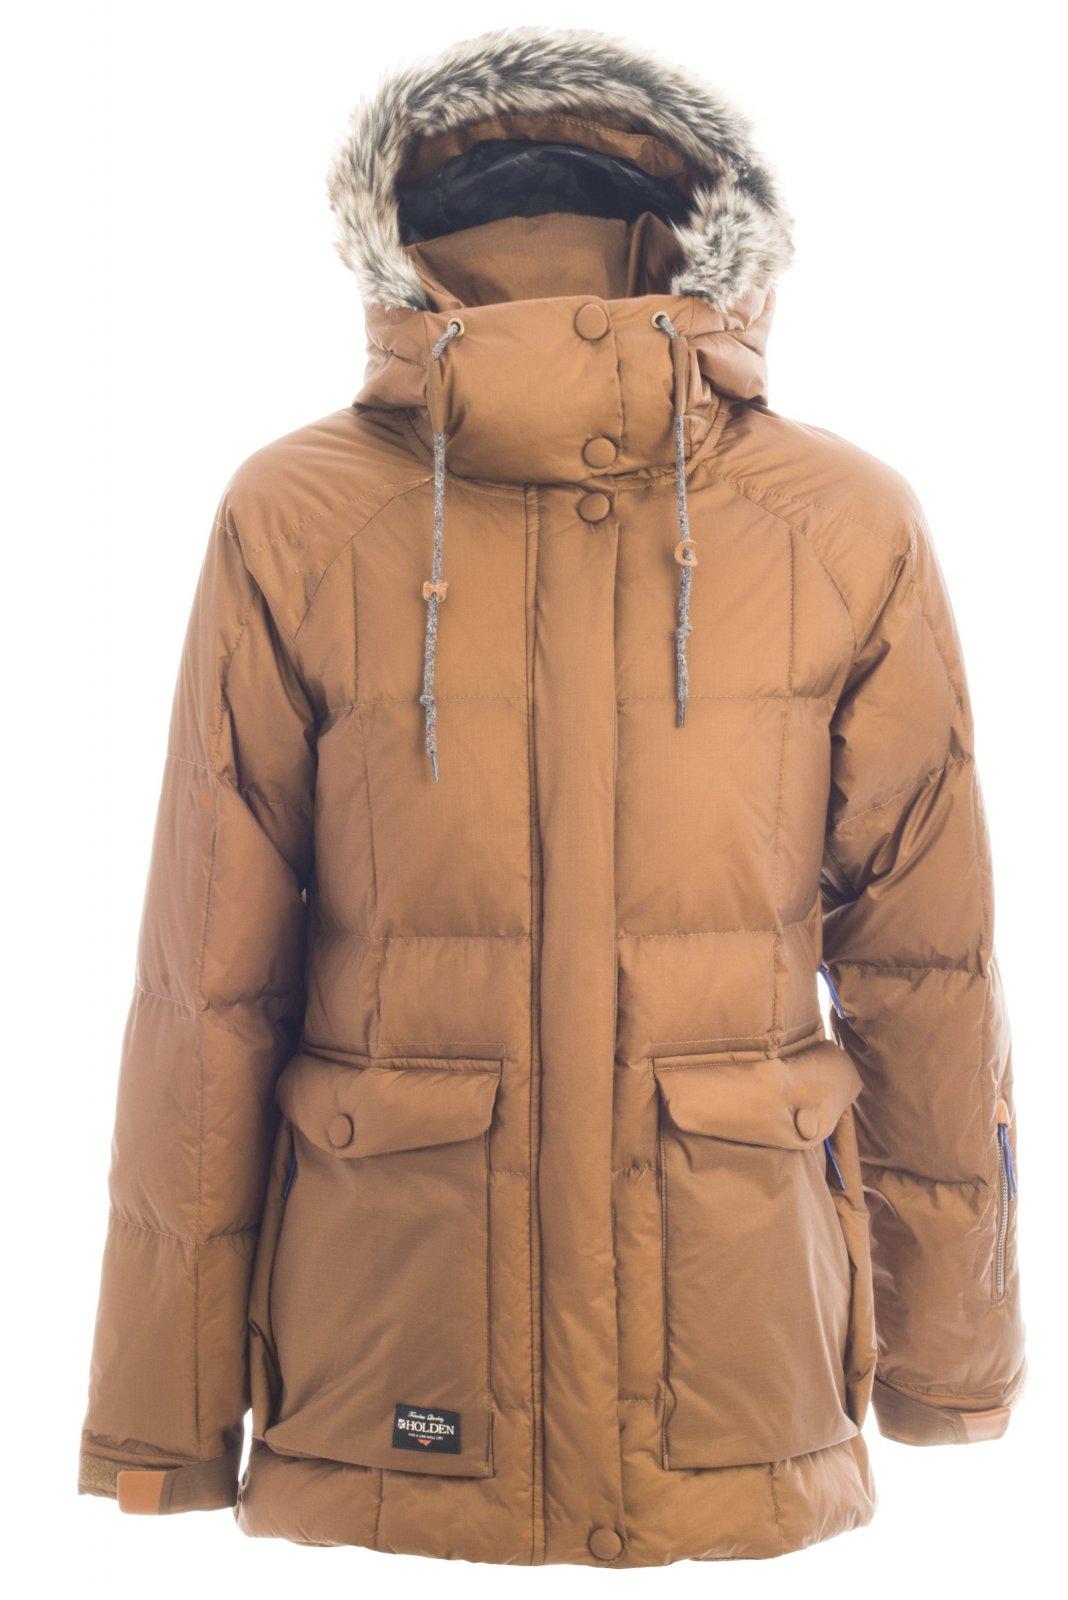 Holden Women's Carter Jacket